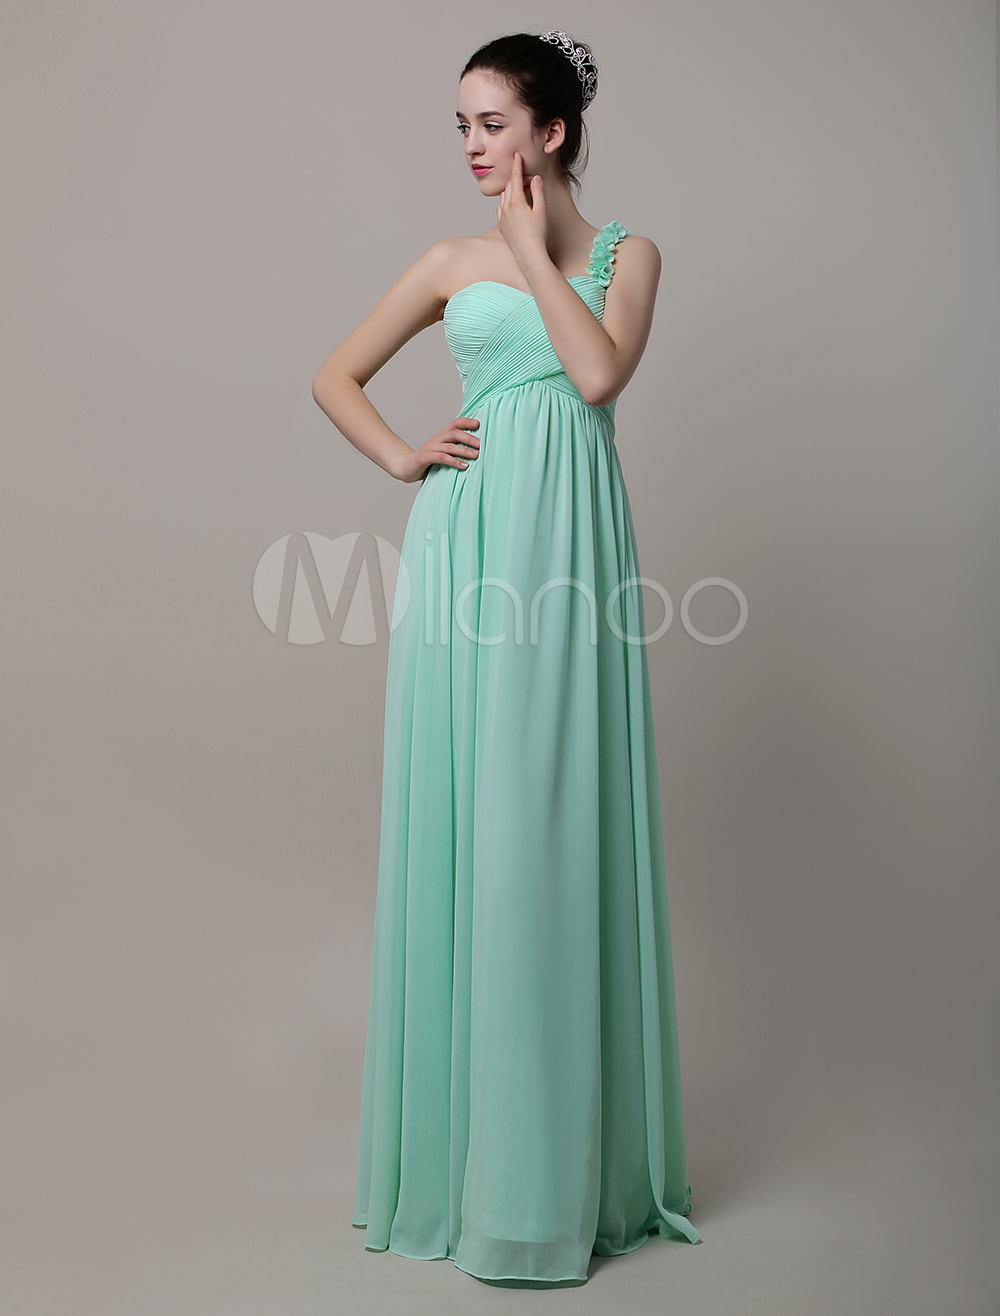 Sweatheart One Shoulder Floor-Length Chiffon Brismaid Dress